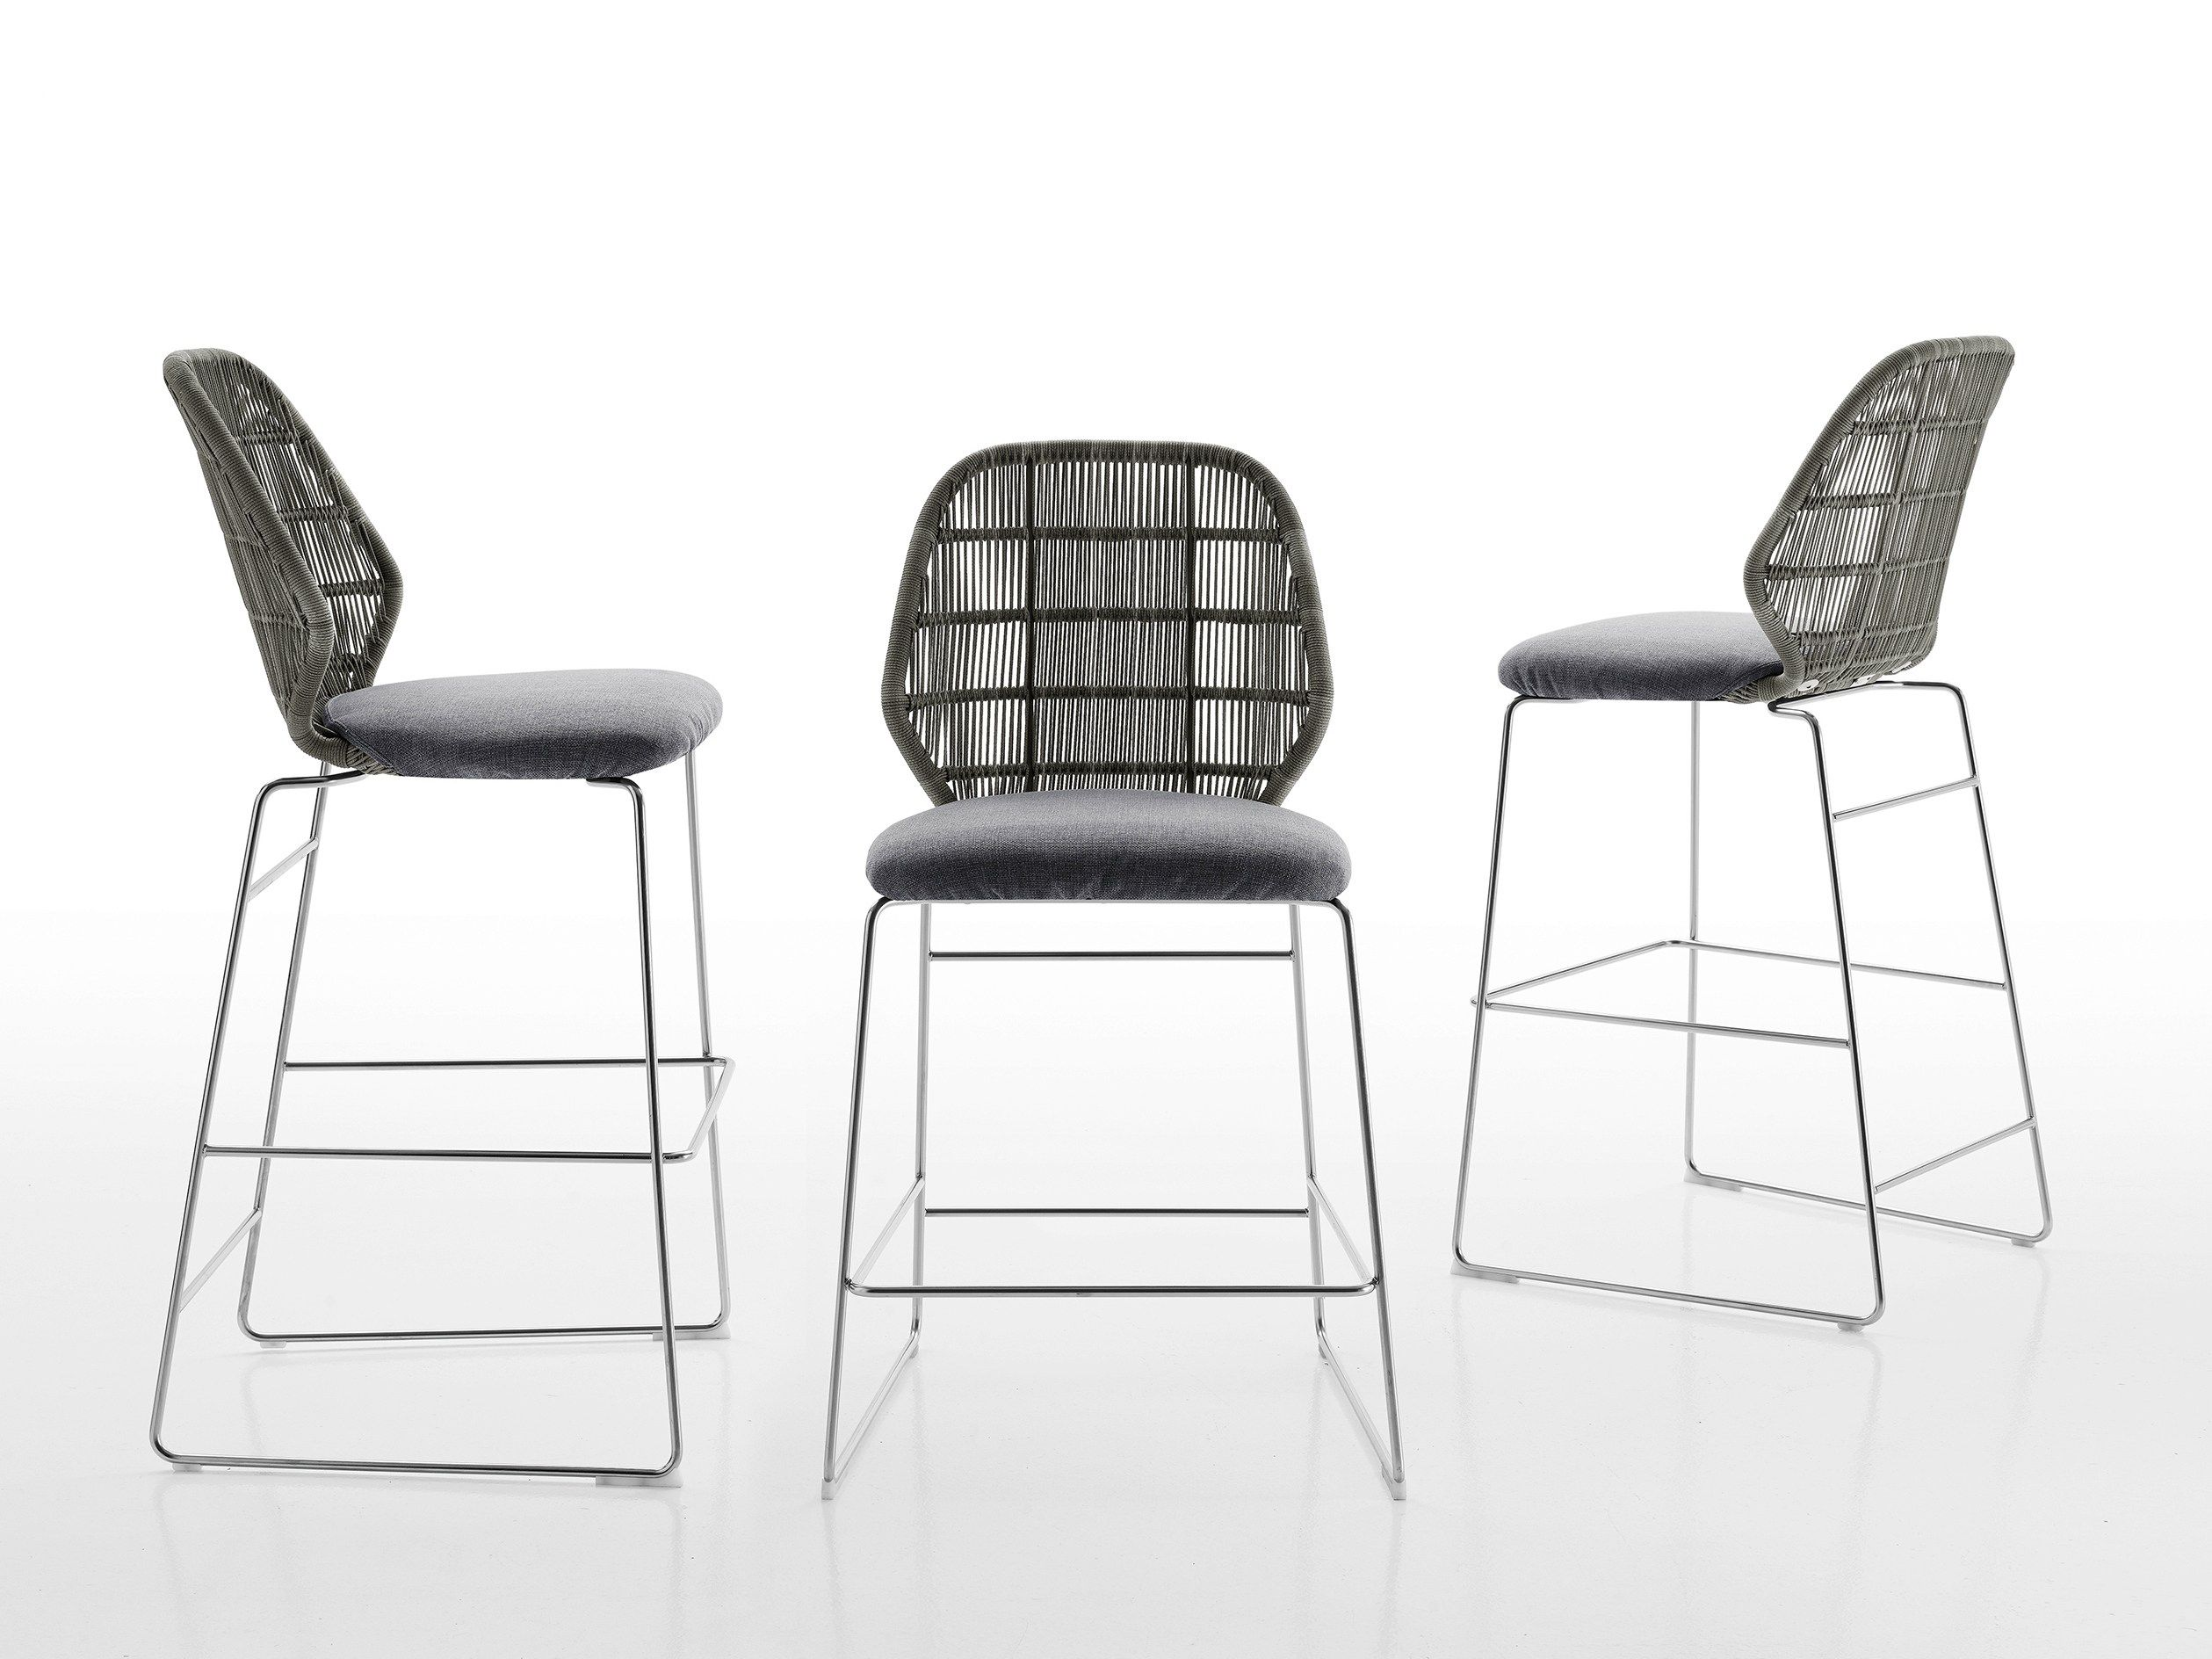 Crinoline cadeira alta by b b italia outdoor a brand of b for B b italia spa